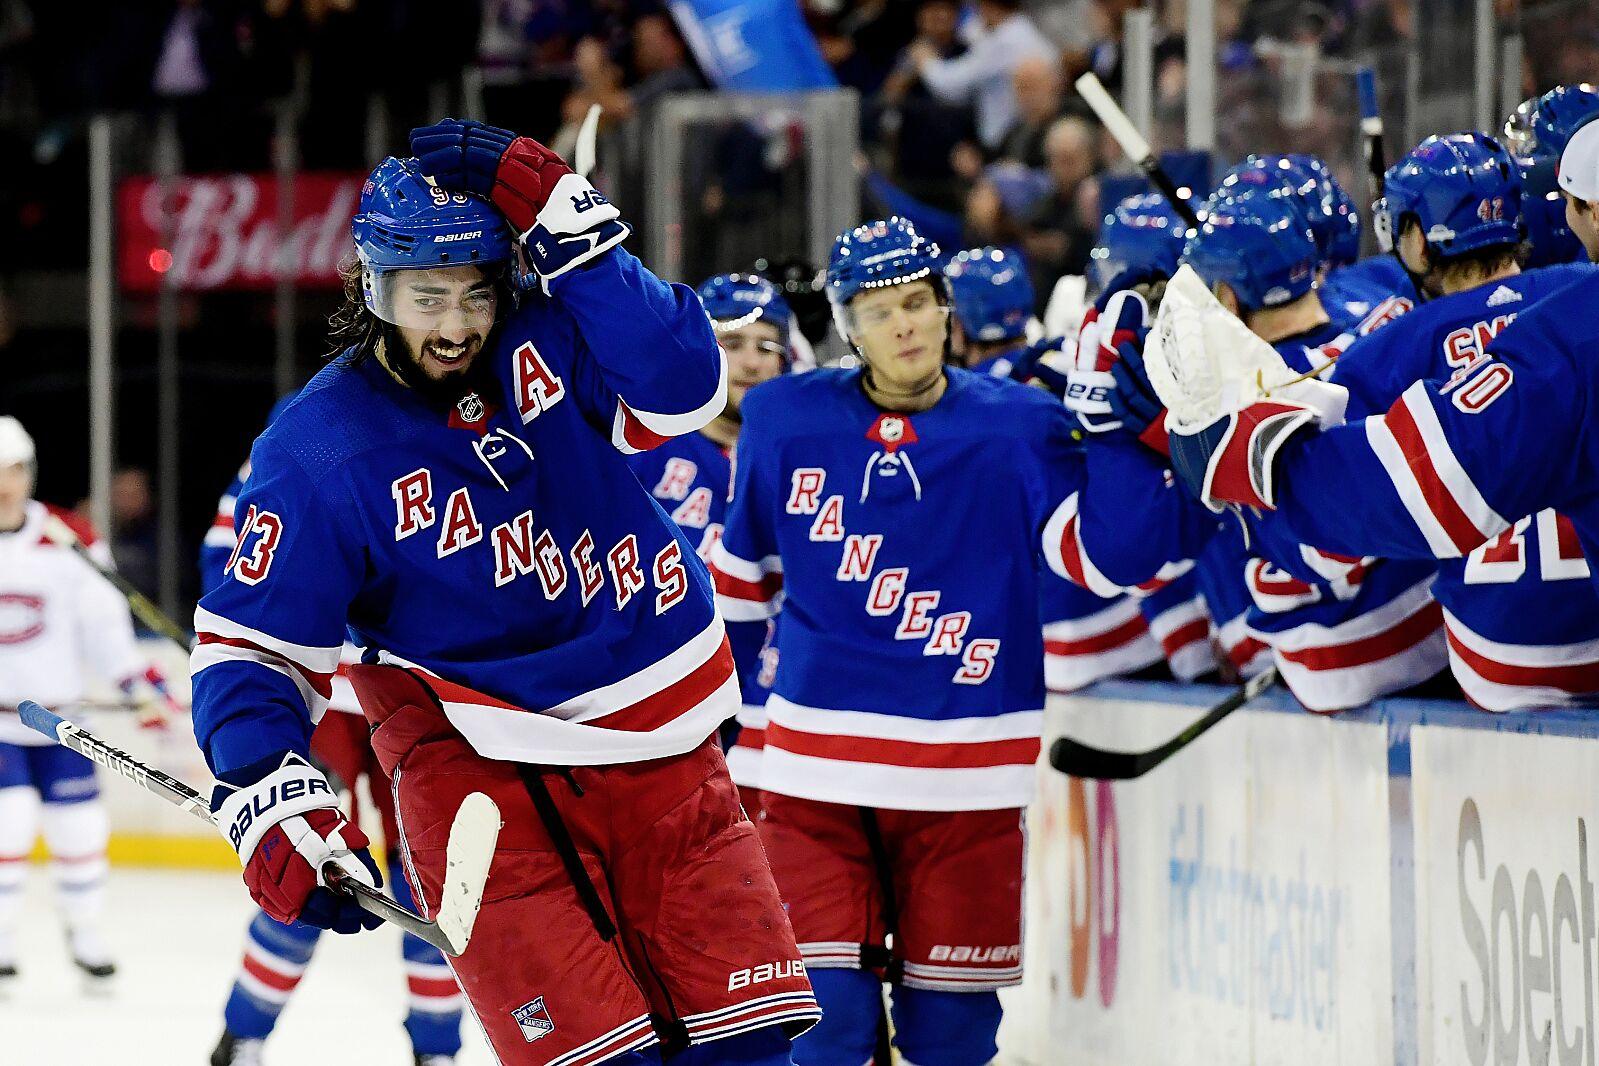 Nhl Mailbag Reviewing Ny Rangers Rebuild New York Islanders More